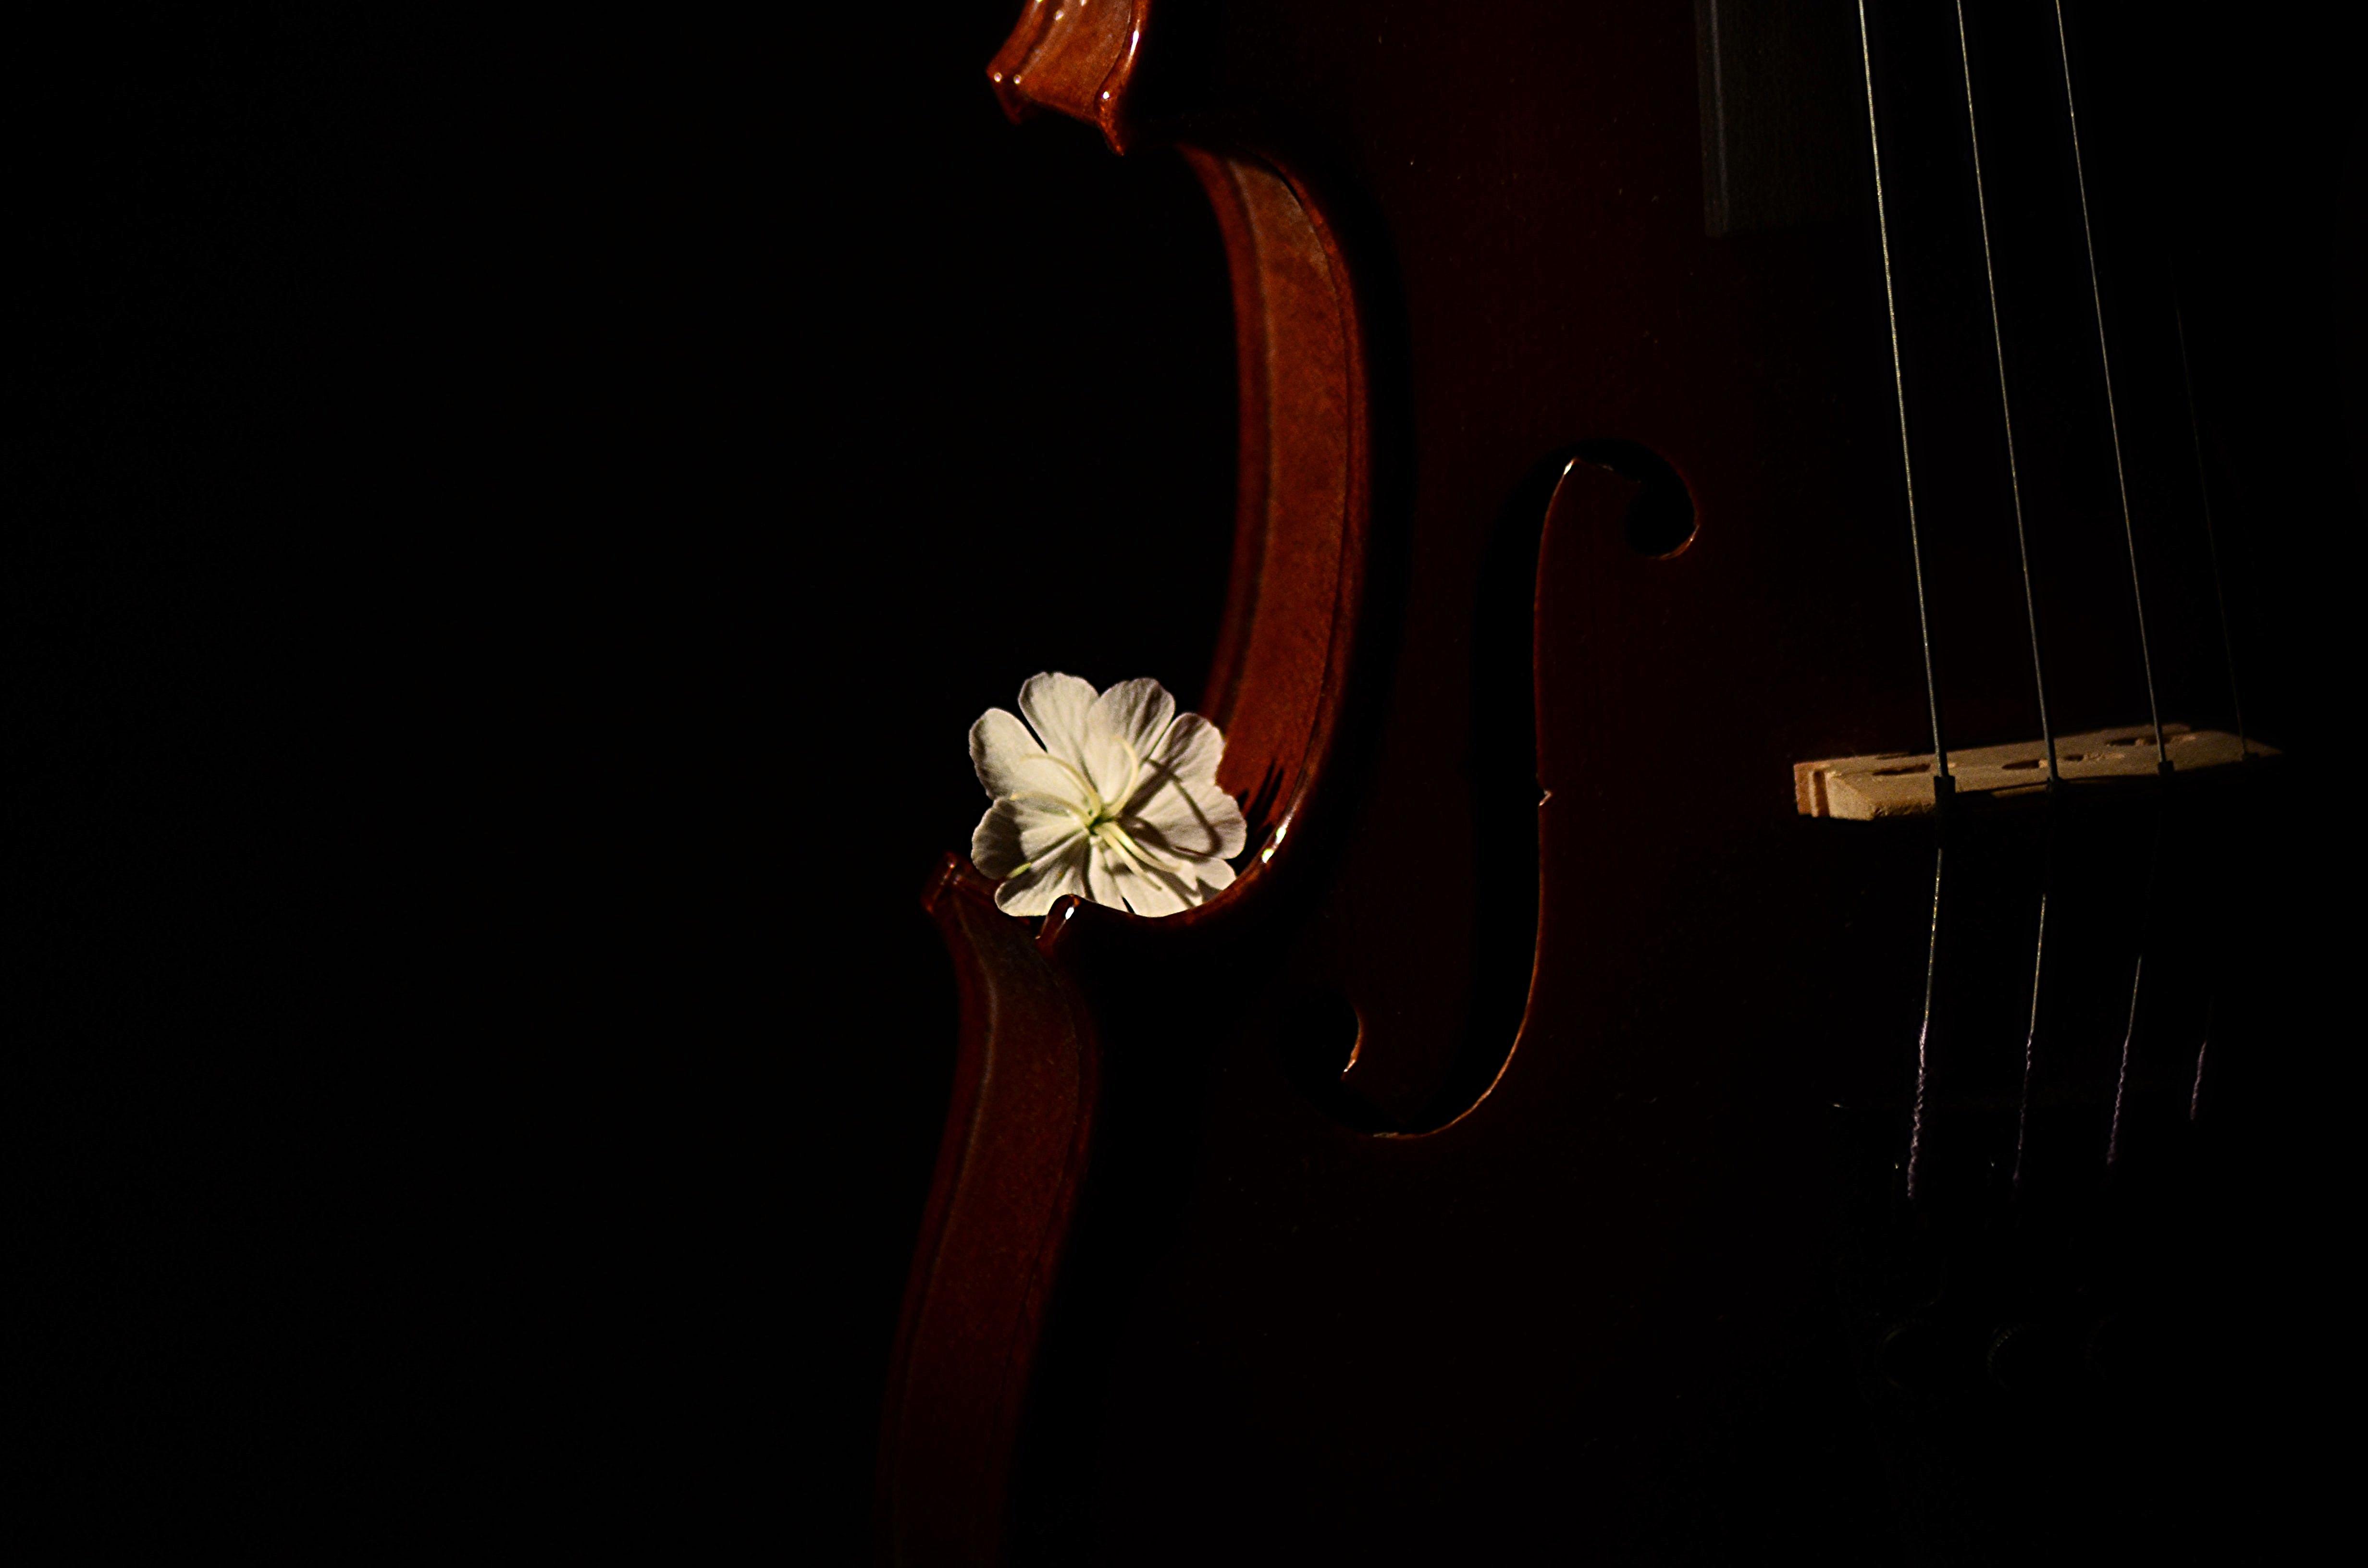 Wallpaper : violin, flowers, lightsandshadows